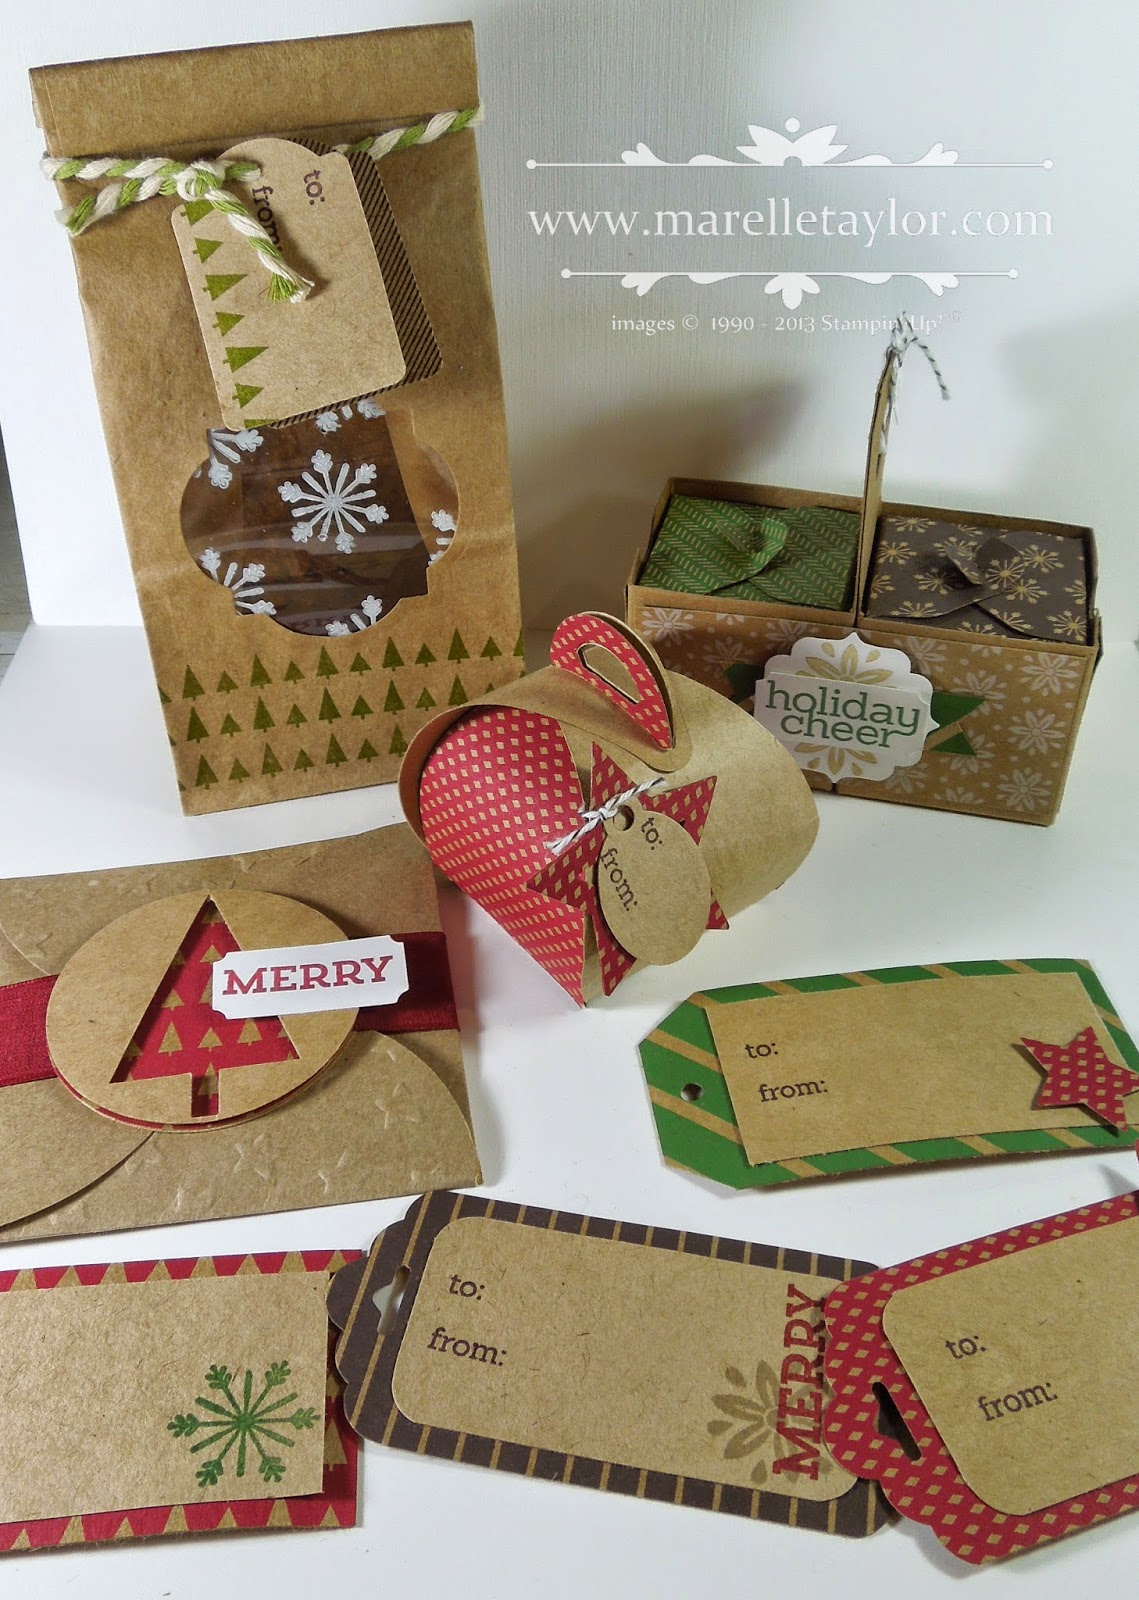 Christmas Gift Bags Australia.Marelle Taylor Stampin Up Demonstrator Sydney Australia